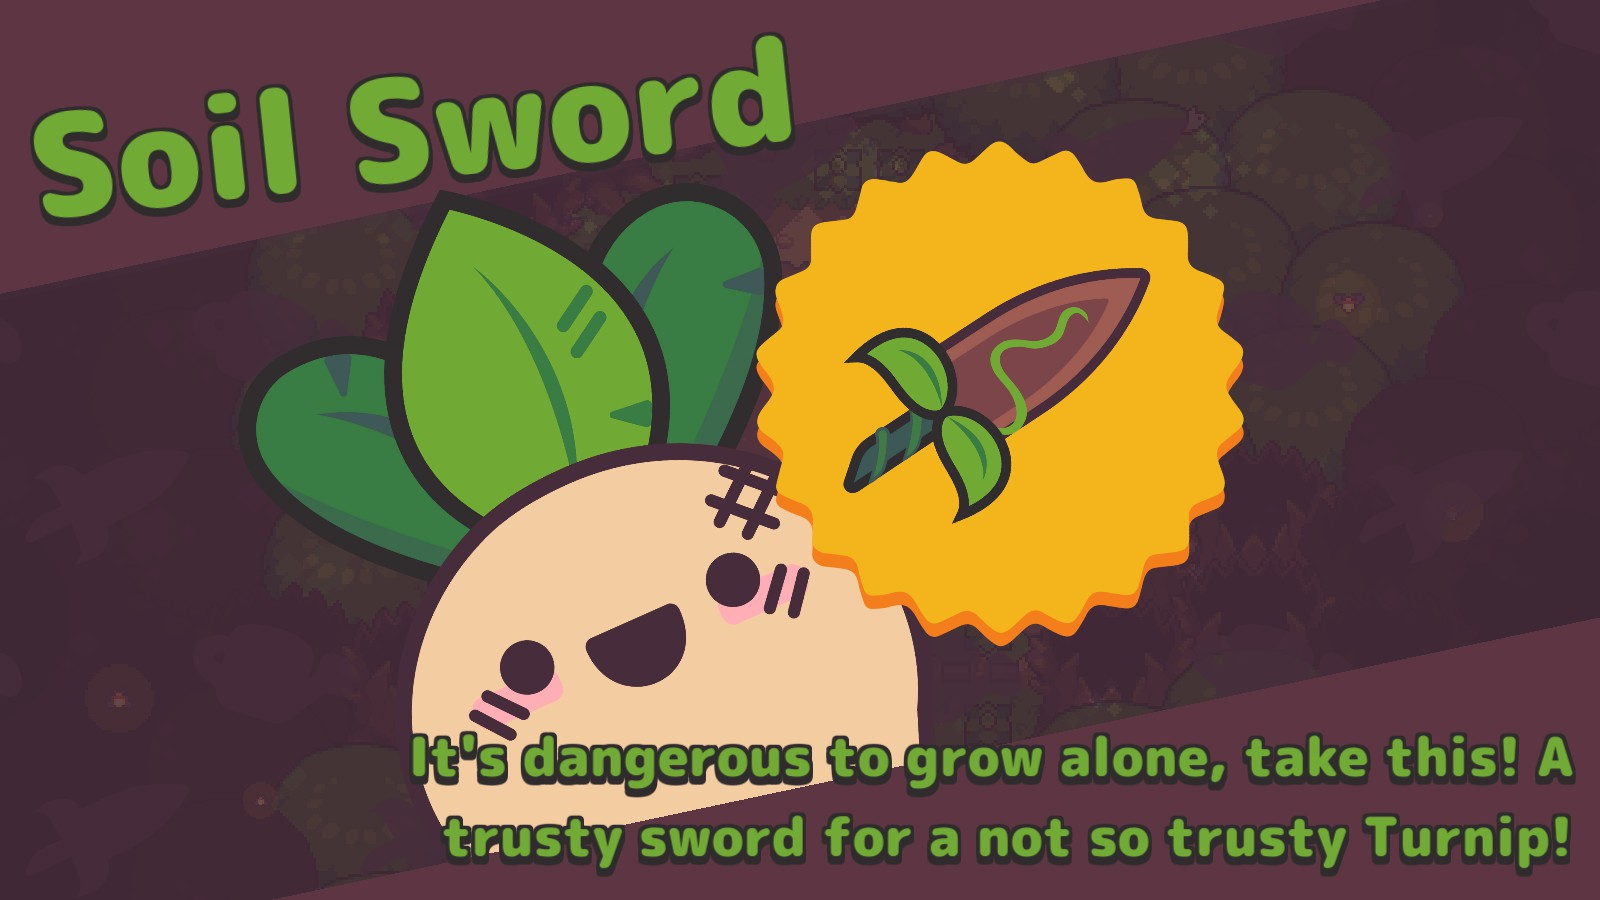 The Soil Sword, Turnip Boy's trusty sword.